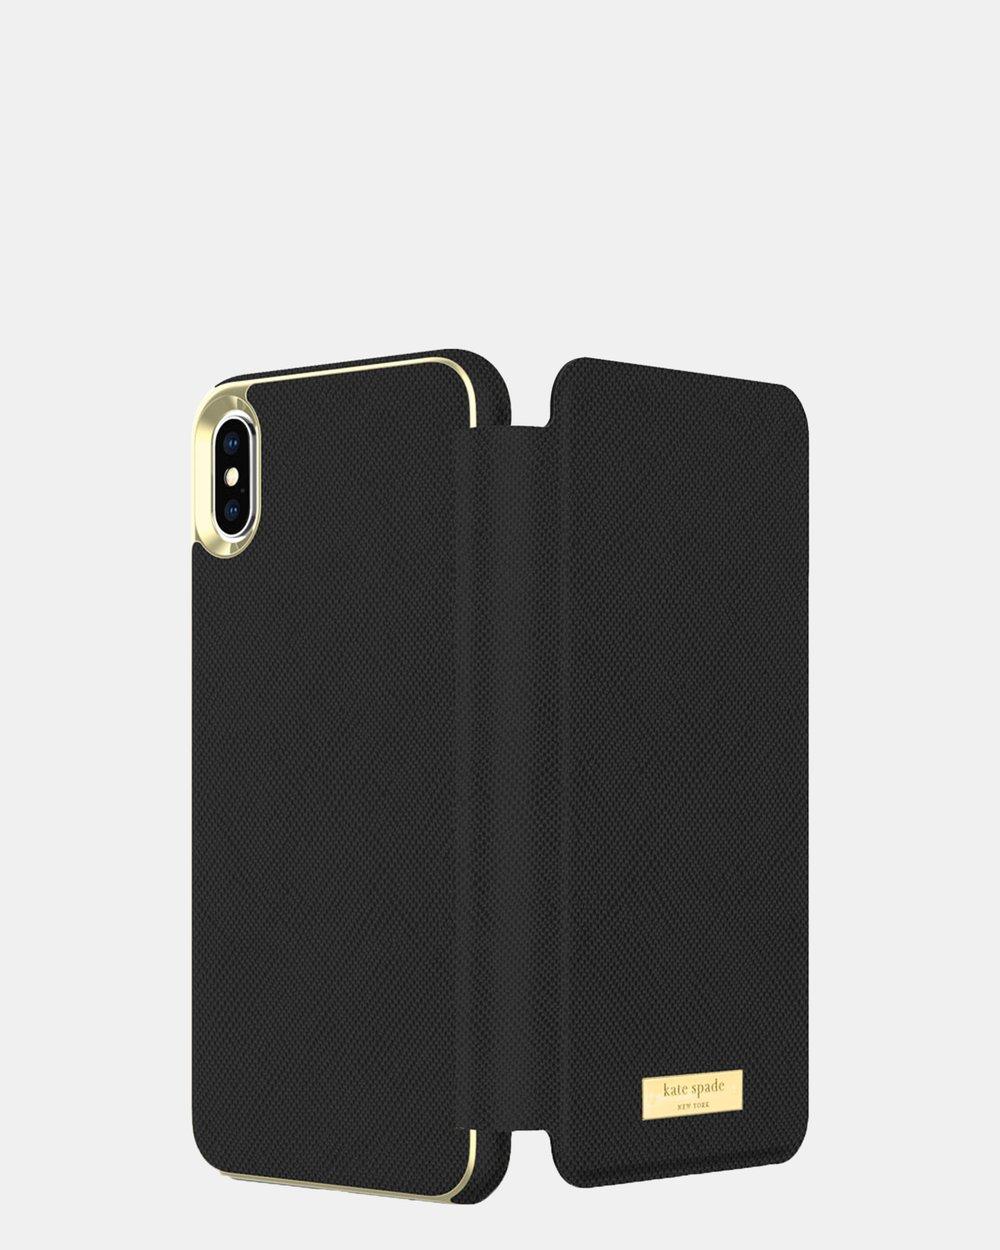 promo code 0ef5c 3fcc5 Kate Spade New York Folio Case for iPhone Xs Max